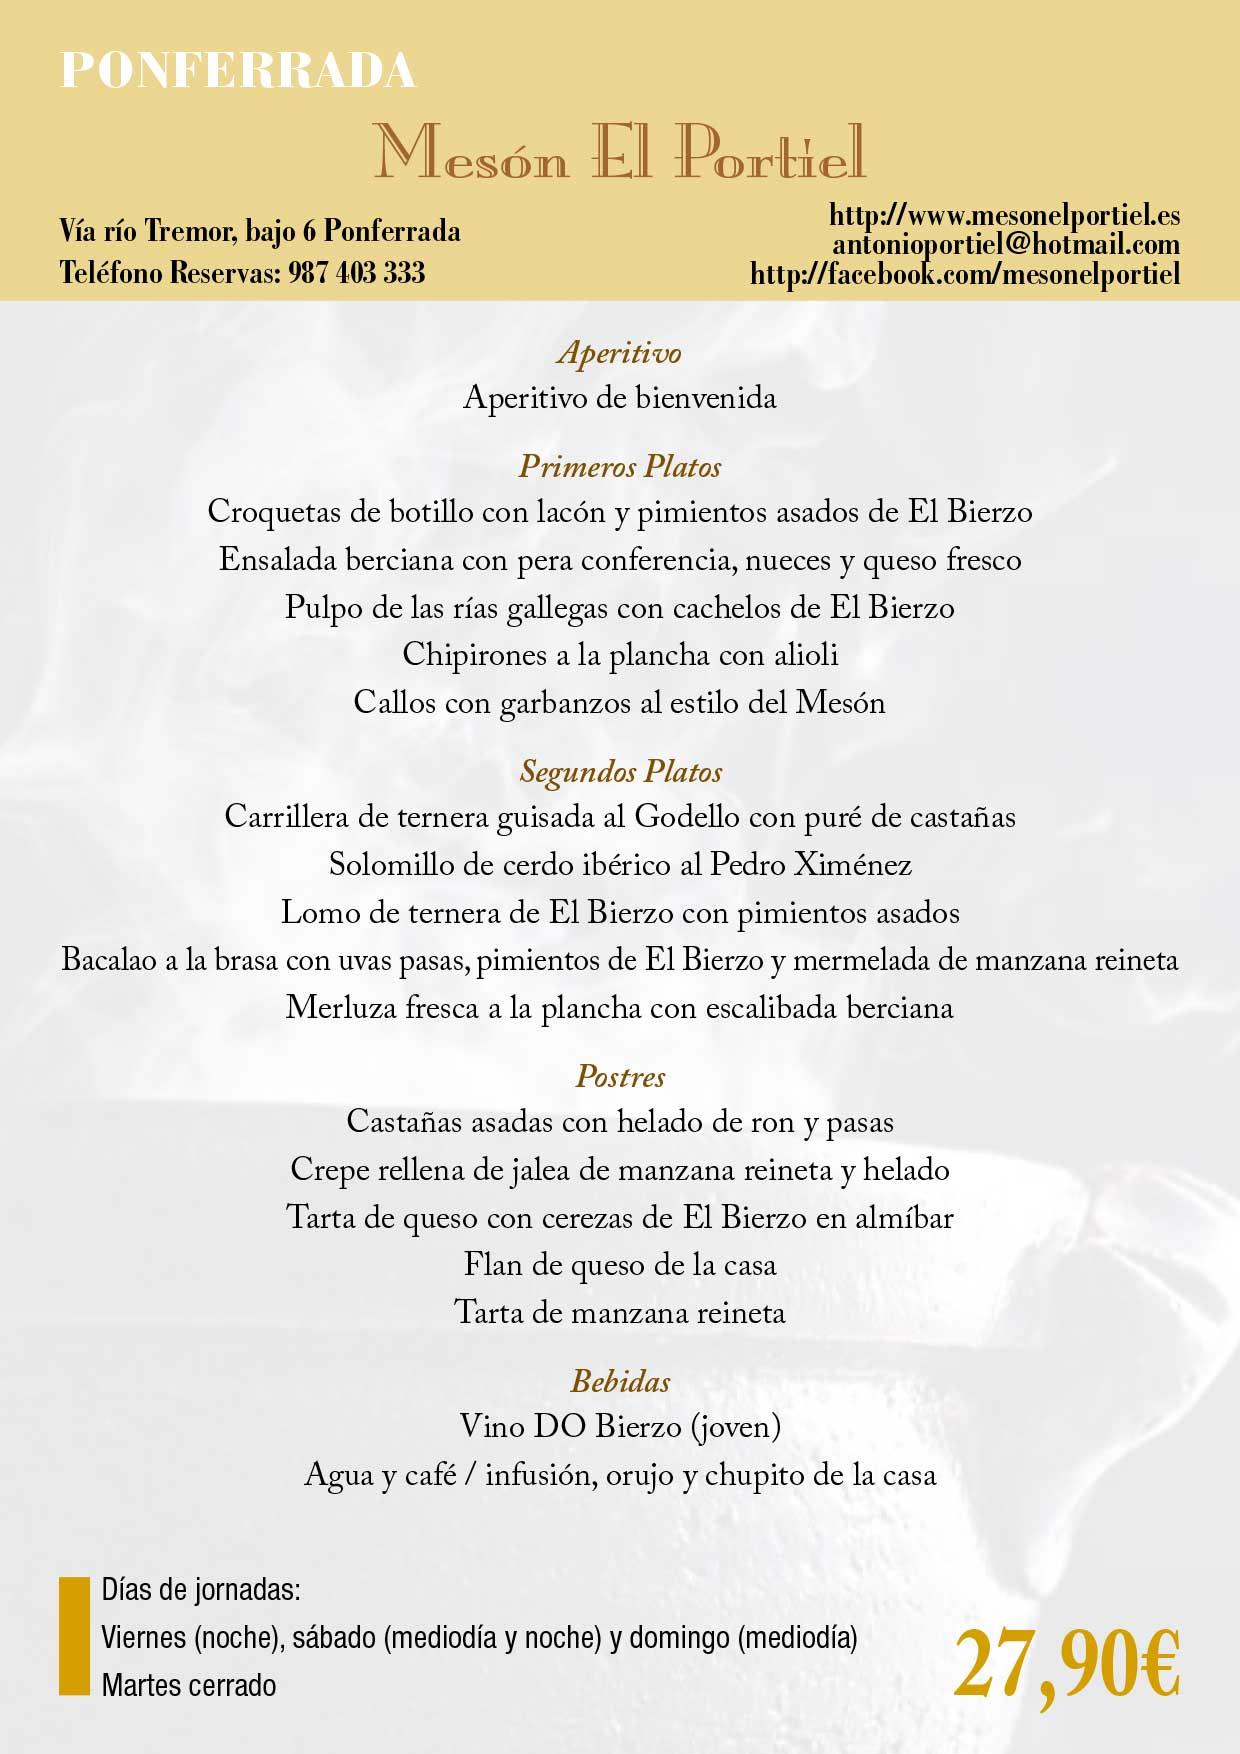 XXXIII Jornadas gastronómicas del Bierzo 2017. Restaurantes participantes 21